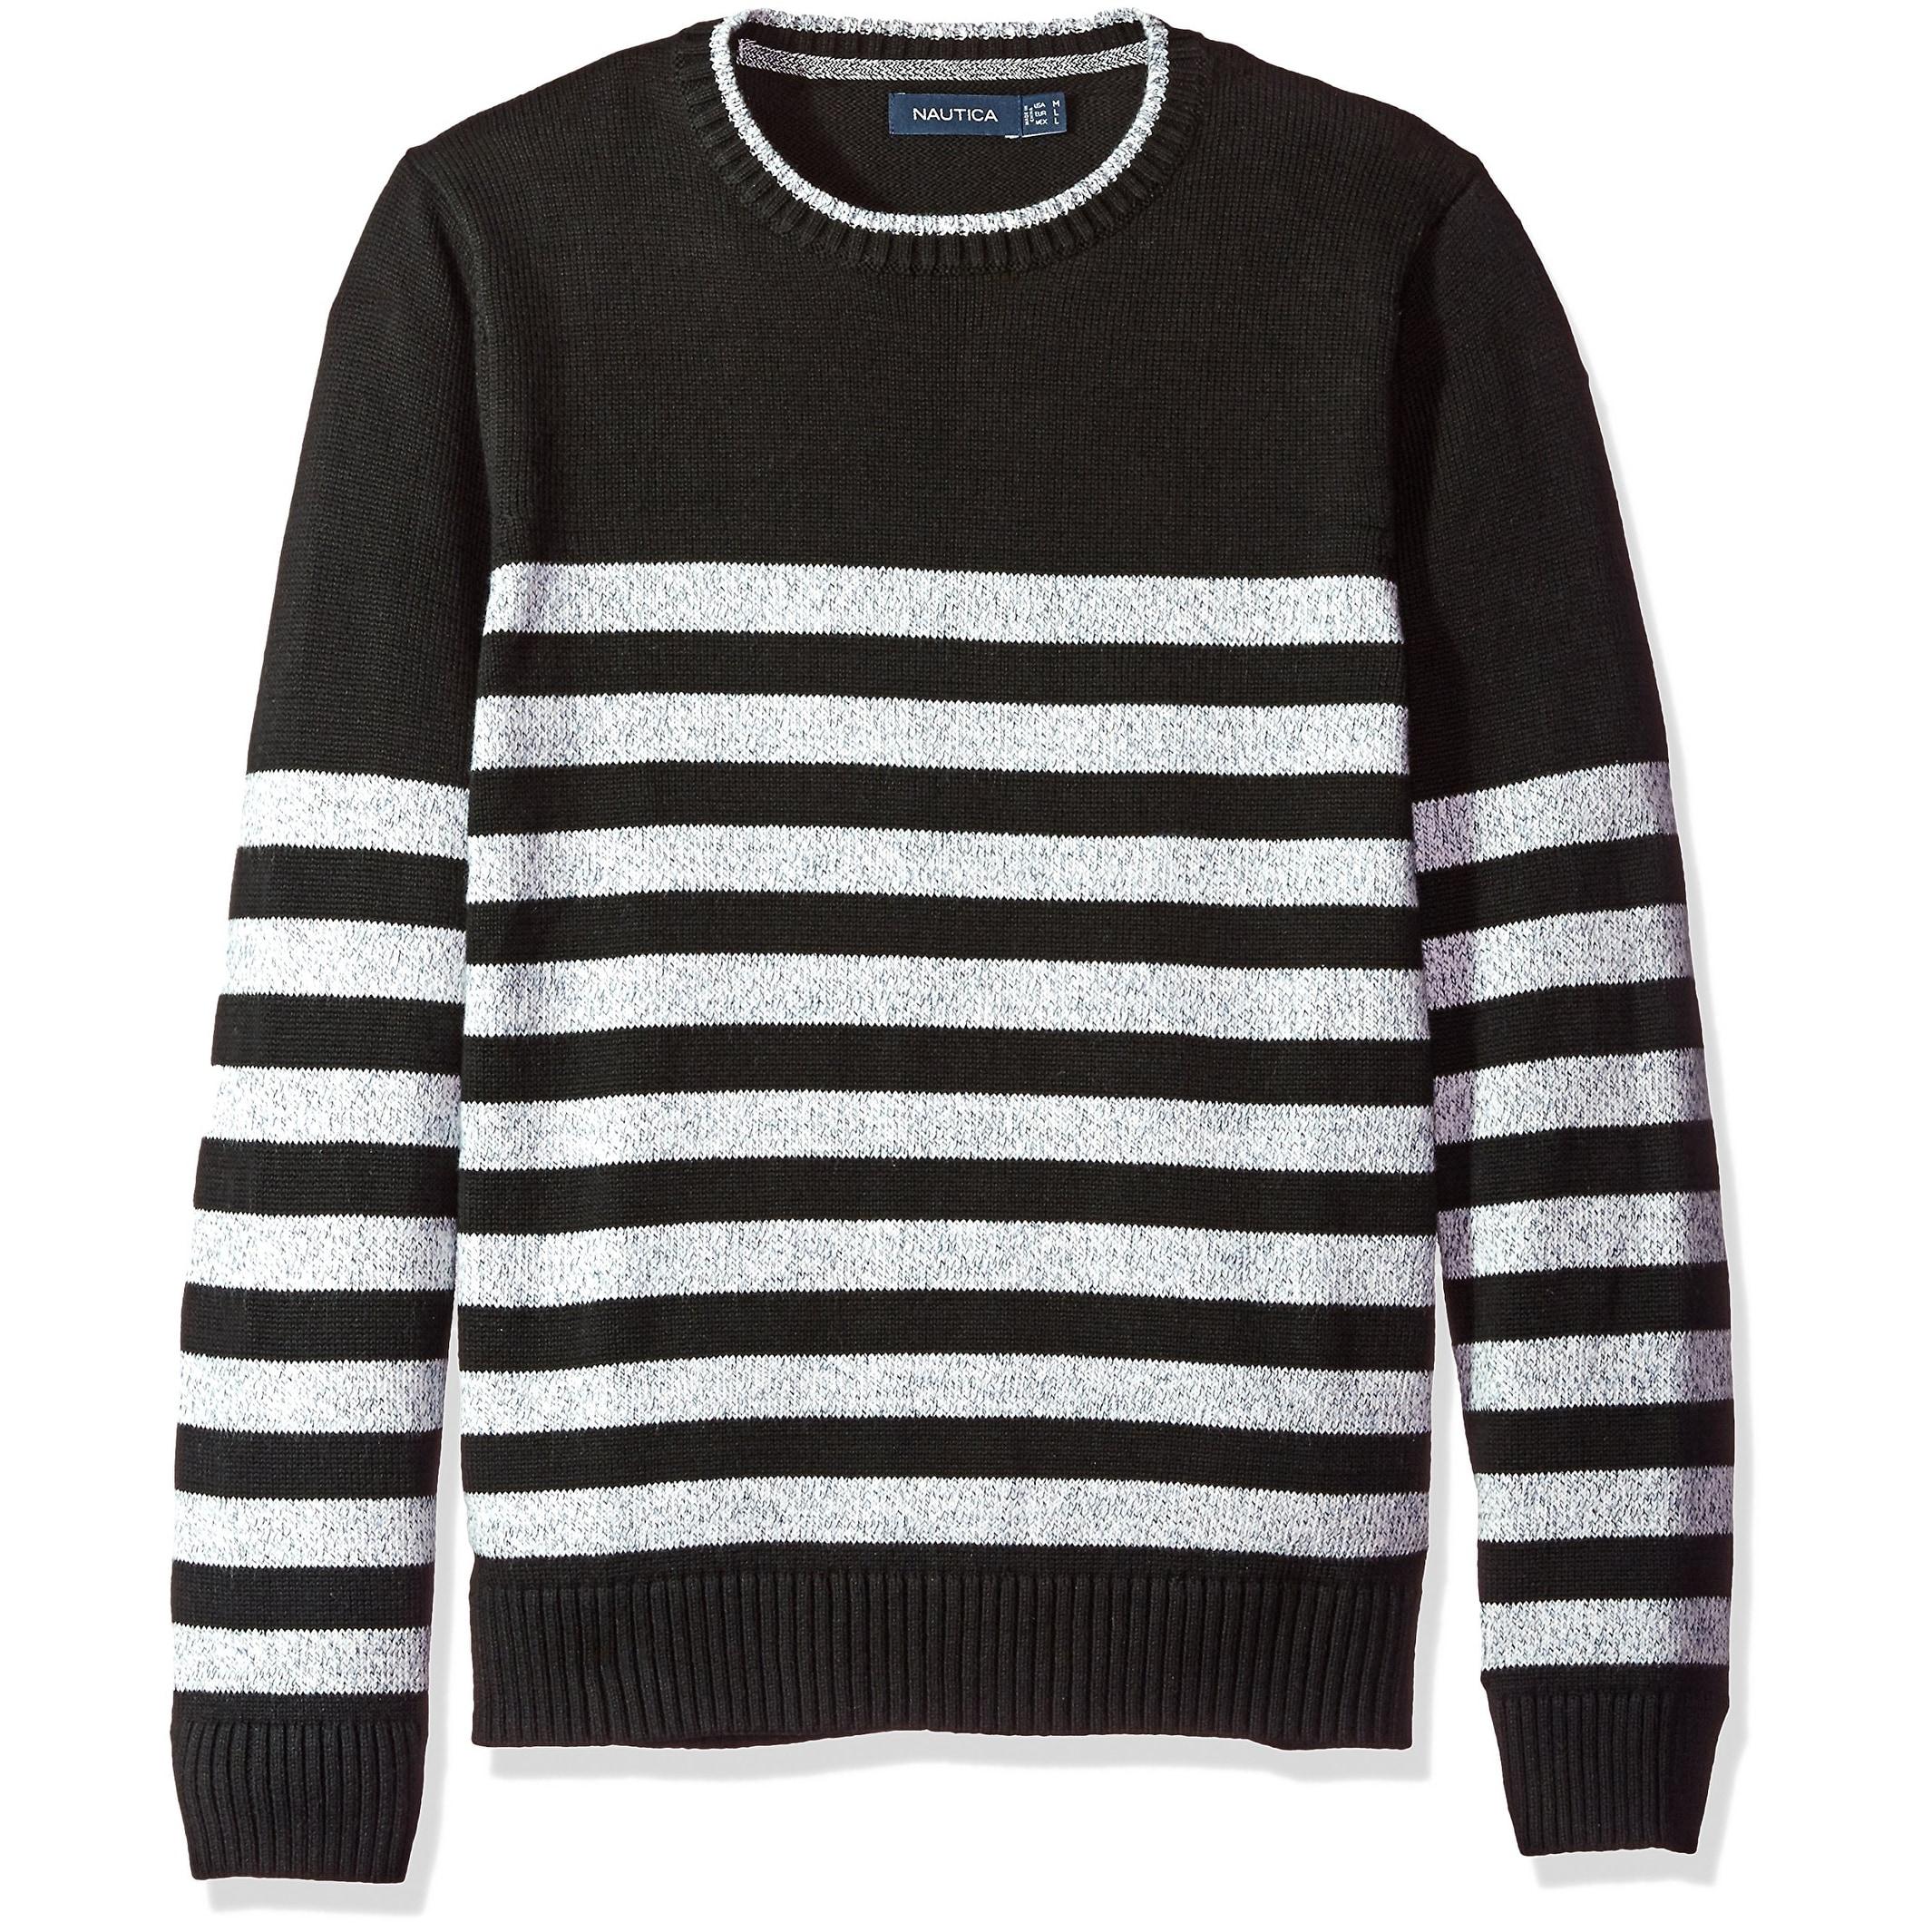 NEW NAUTICA Black Sweater Size Medium M Cable Knit V Neck Top Long Sleeve Shirt